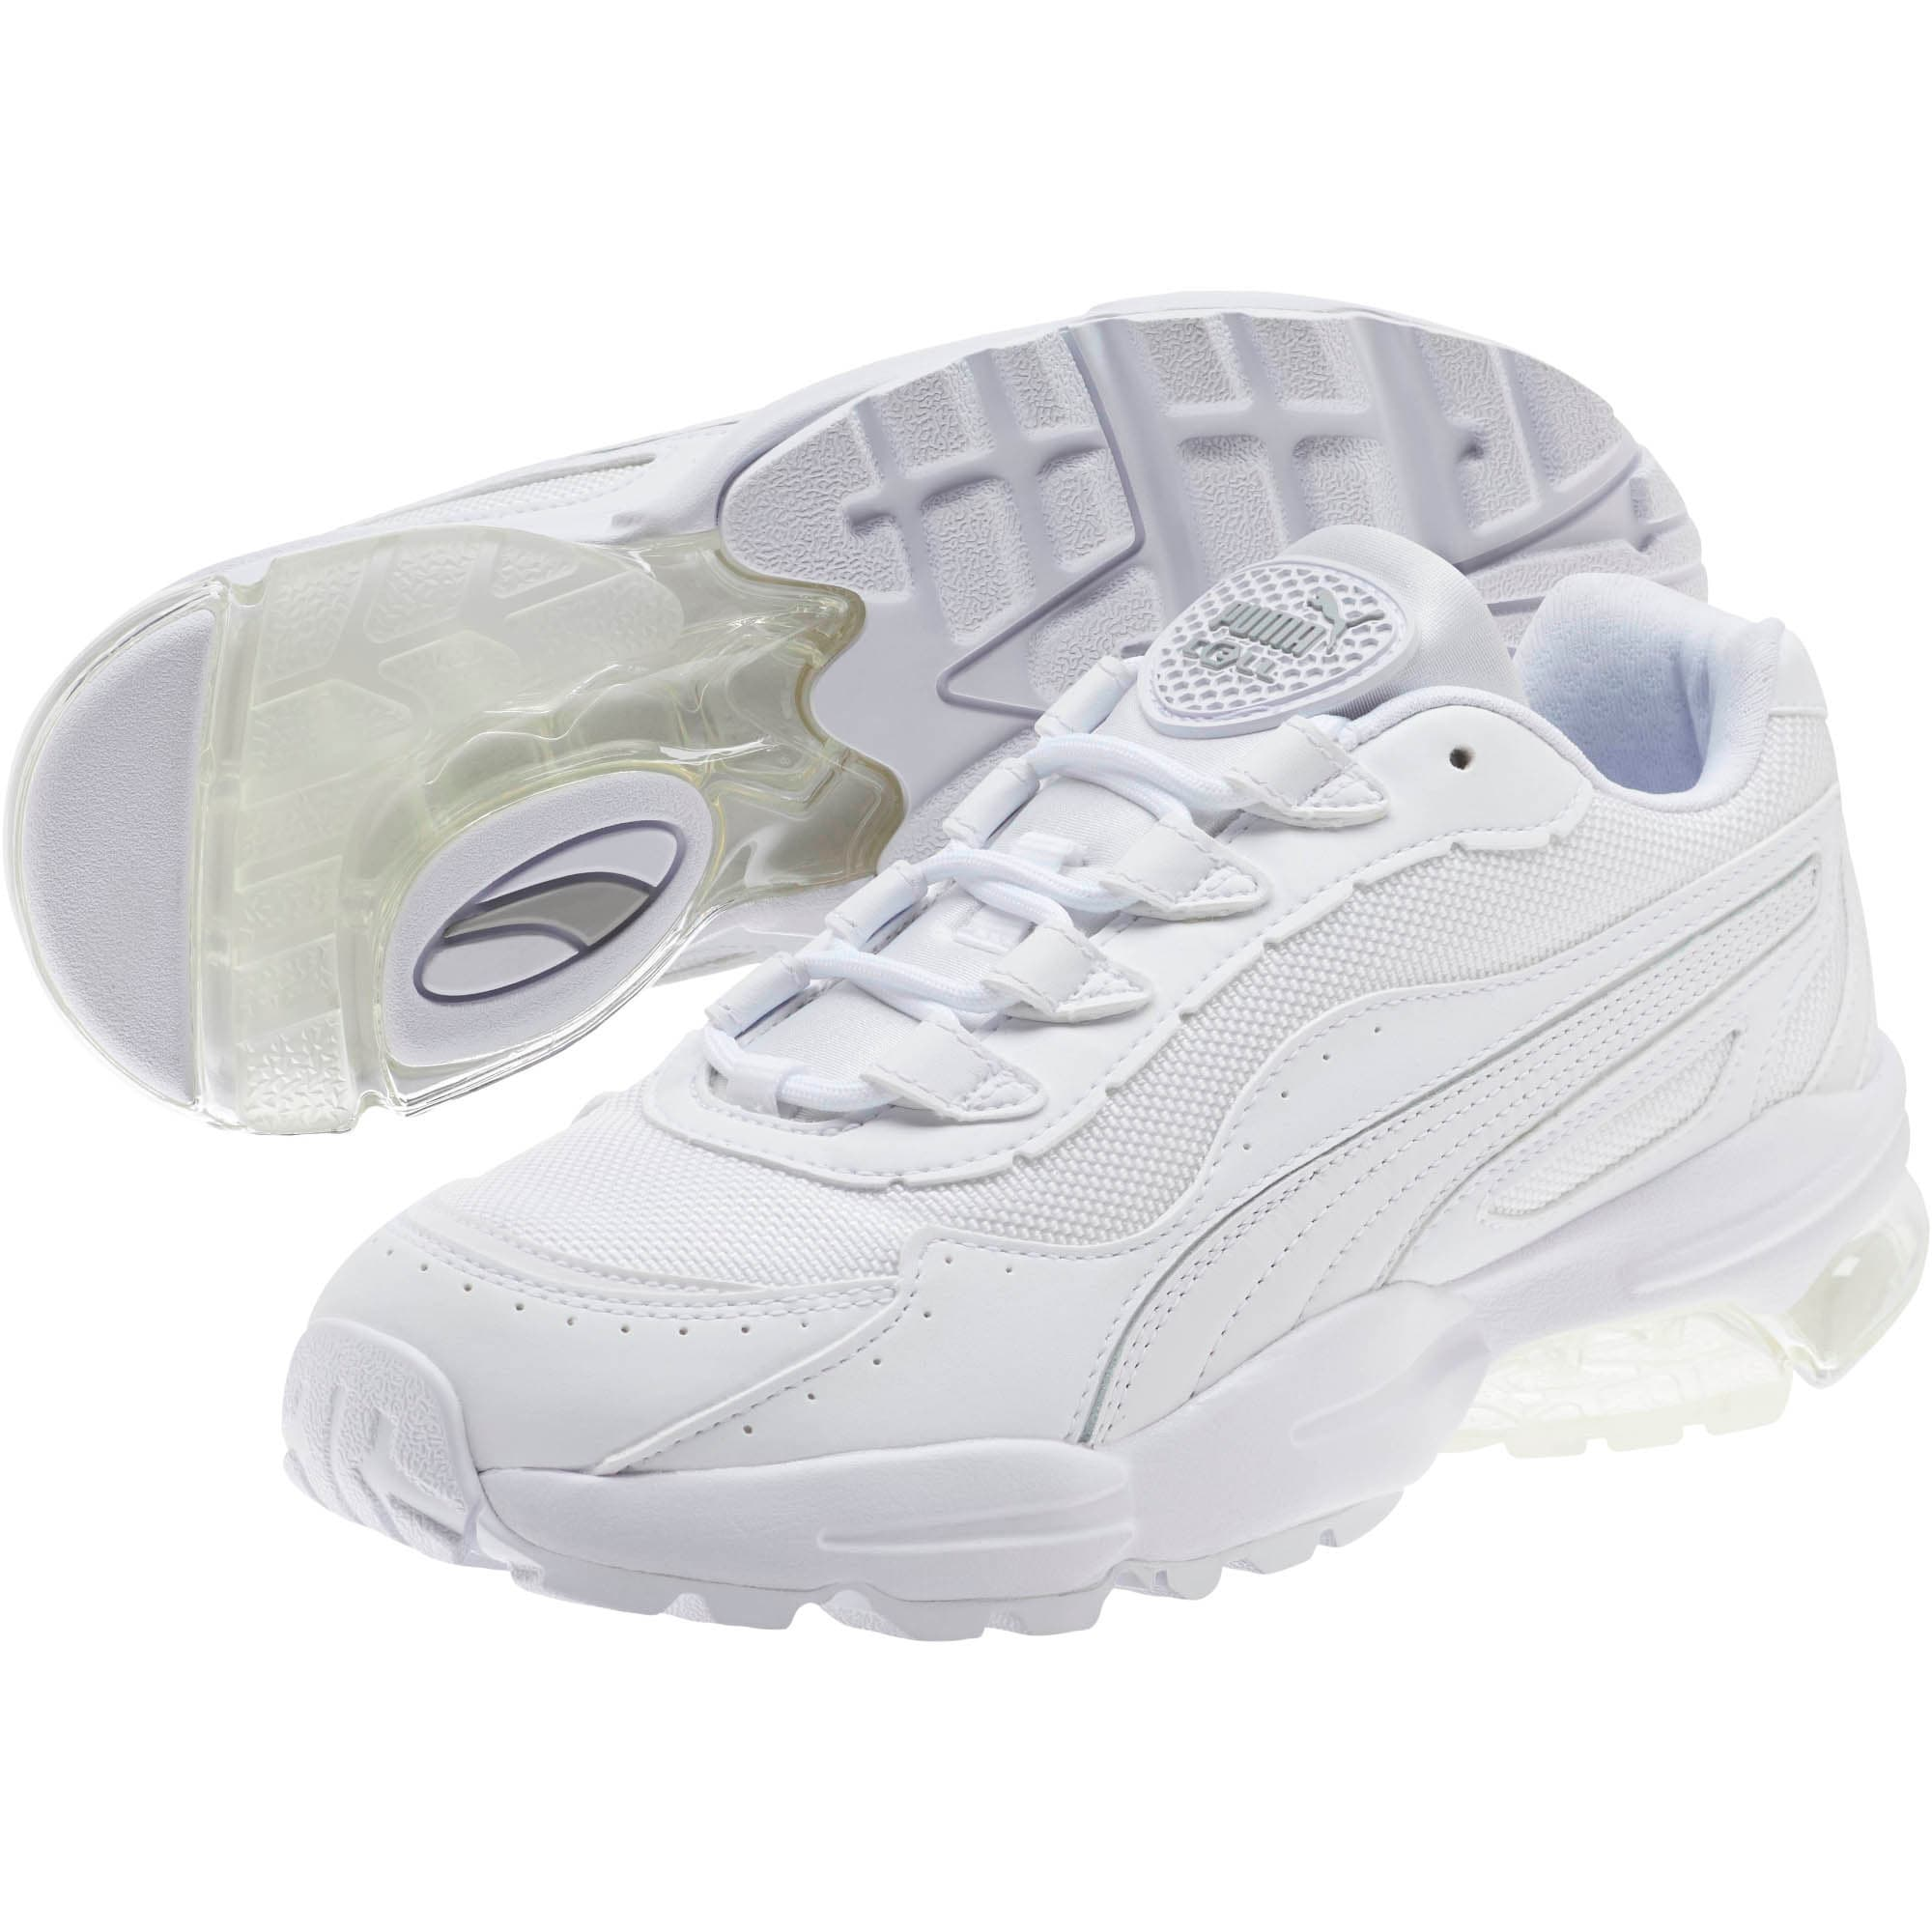 Thumbnail 2 of CELL Stellar Women's Sneakers, Puma White-Silver, medium